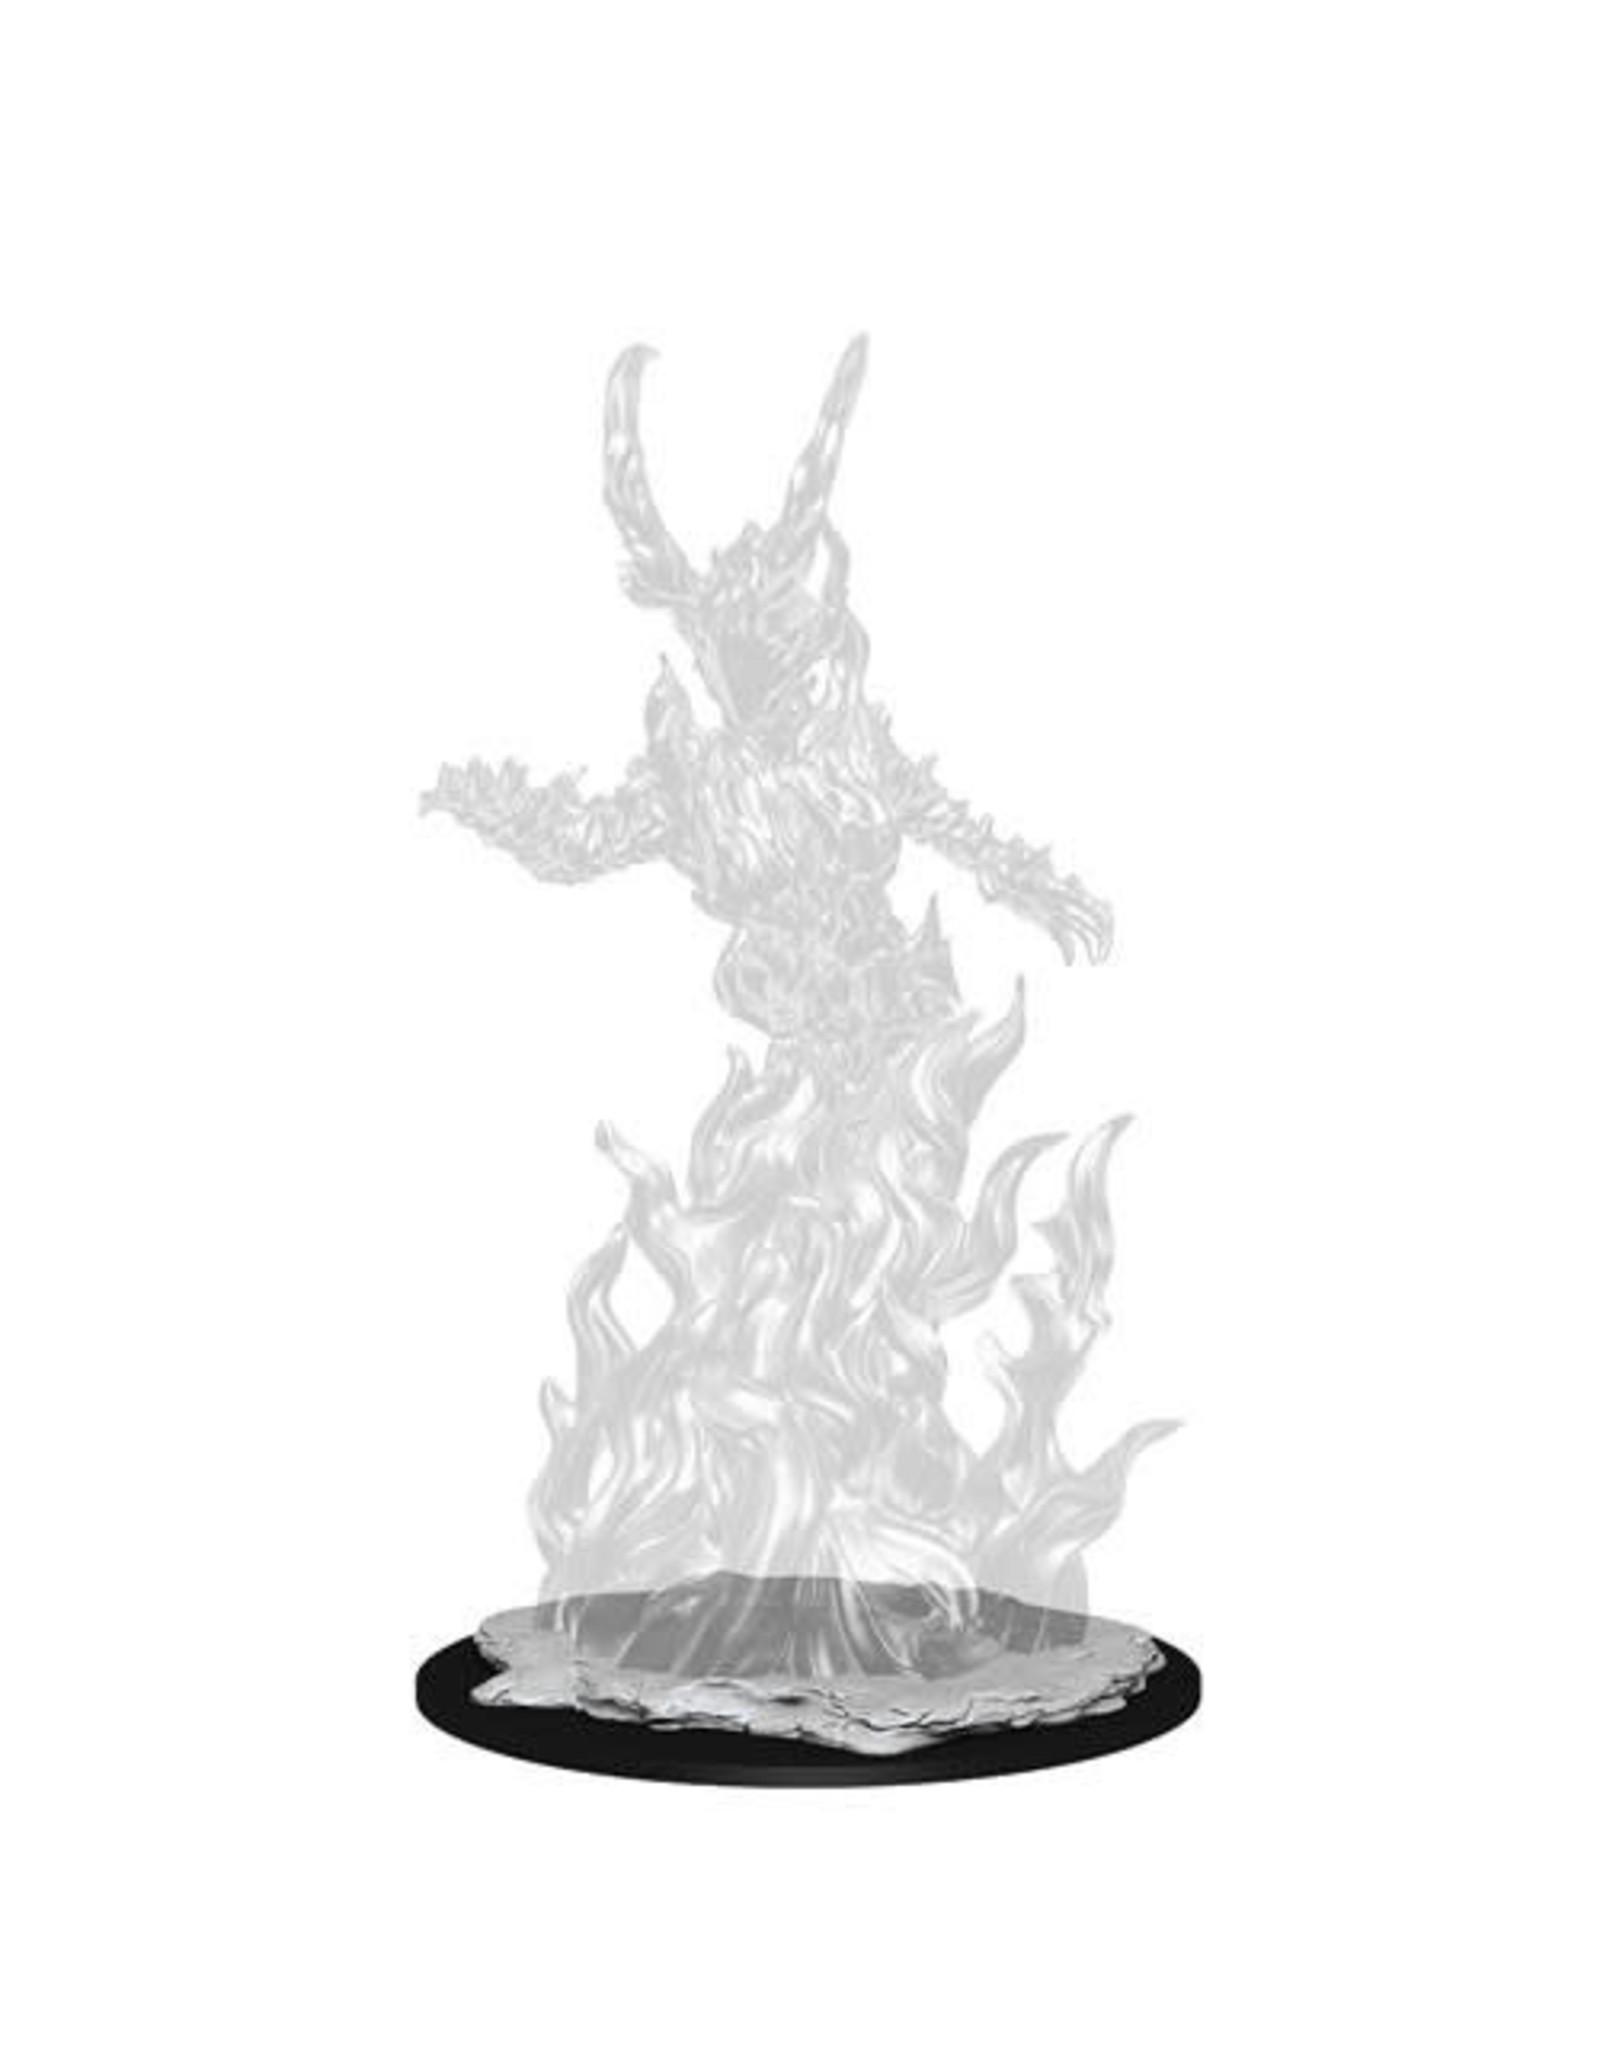 D&D Unpainted Minis: Pathfinder Huge Fire Elemental Lord (Wave 13)